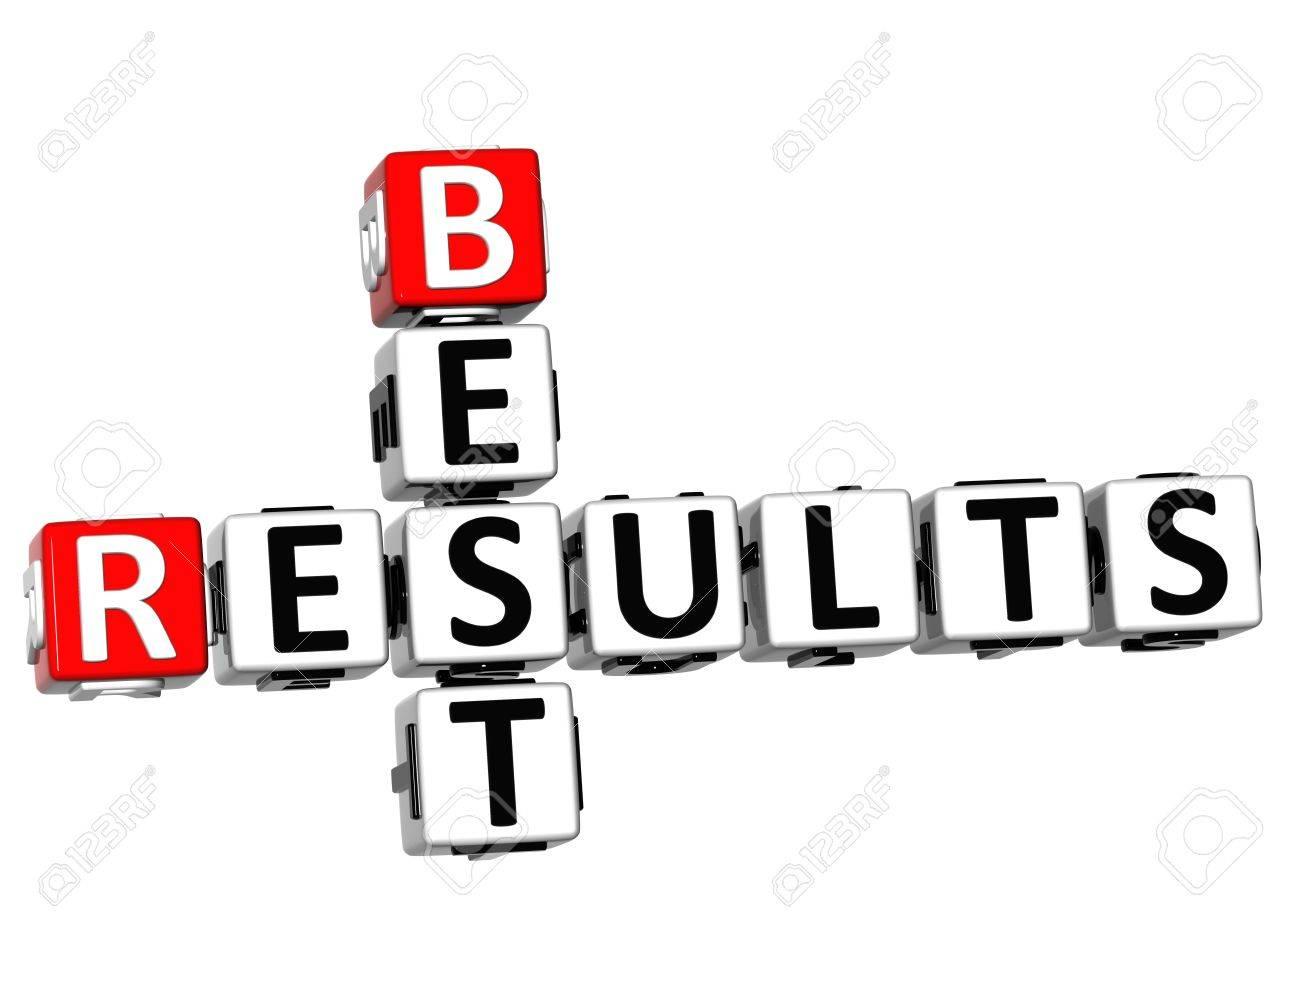 Iglesia Palabra y Poder  Mejores resultados 4e1404032ef